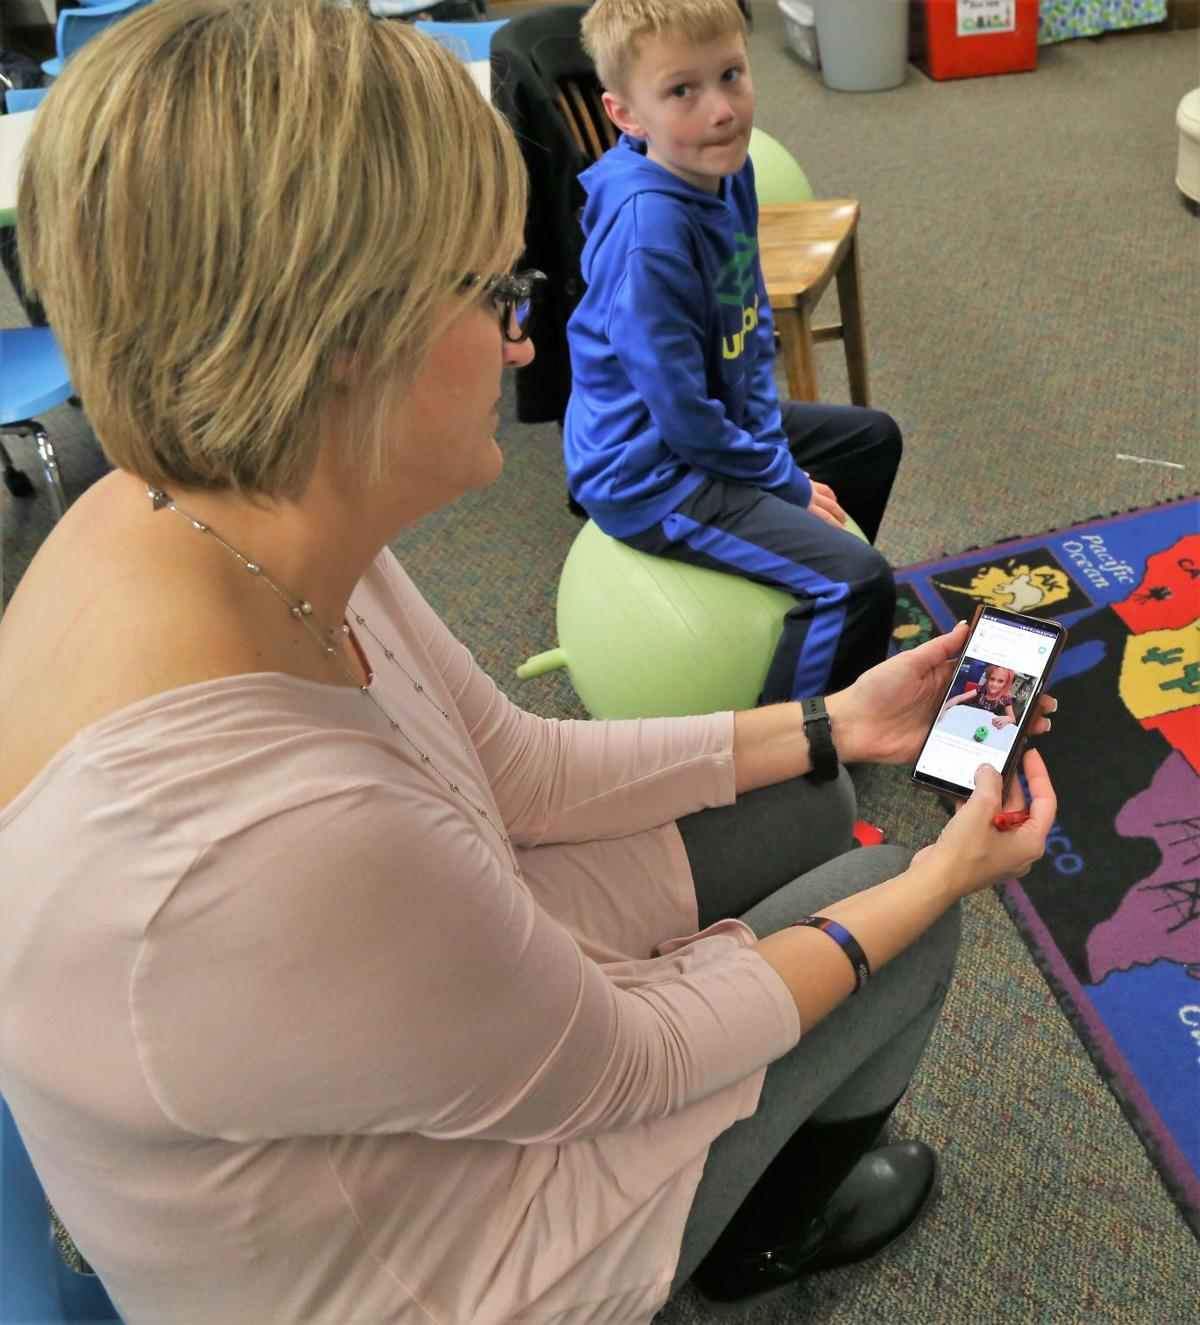 Abby Leonard shows how ClassDojo works on her phone. Her son, Ben Logan, likes the app.